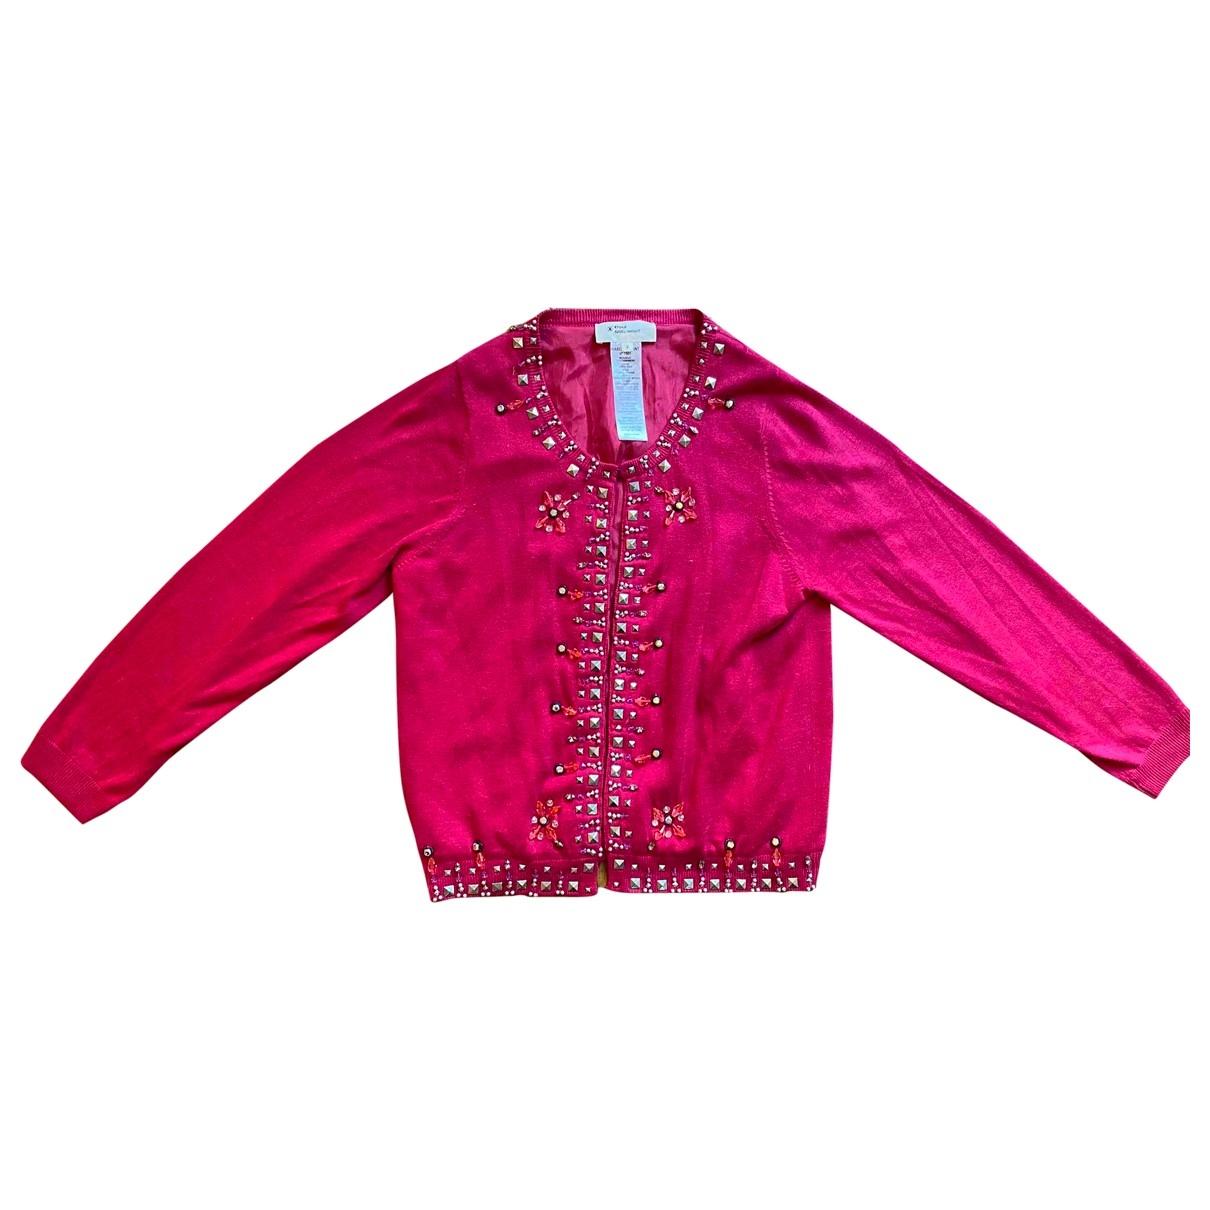 Isabel Marant Etoile - Pull   pour femme en soie - rose